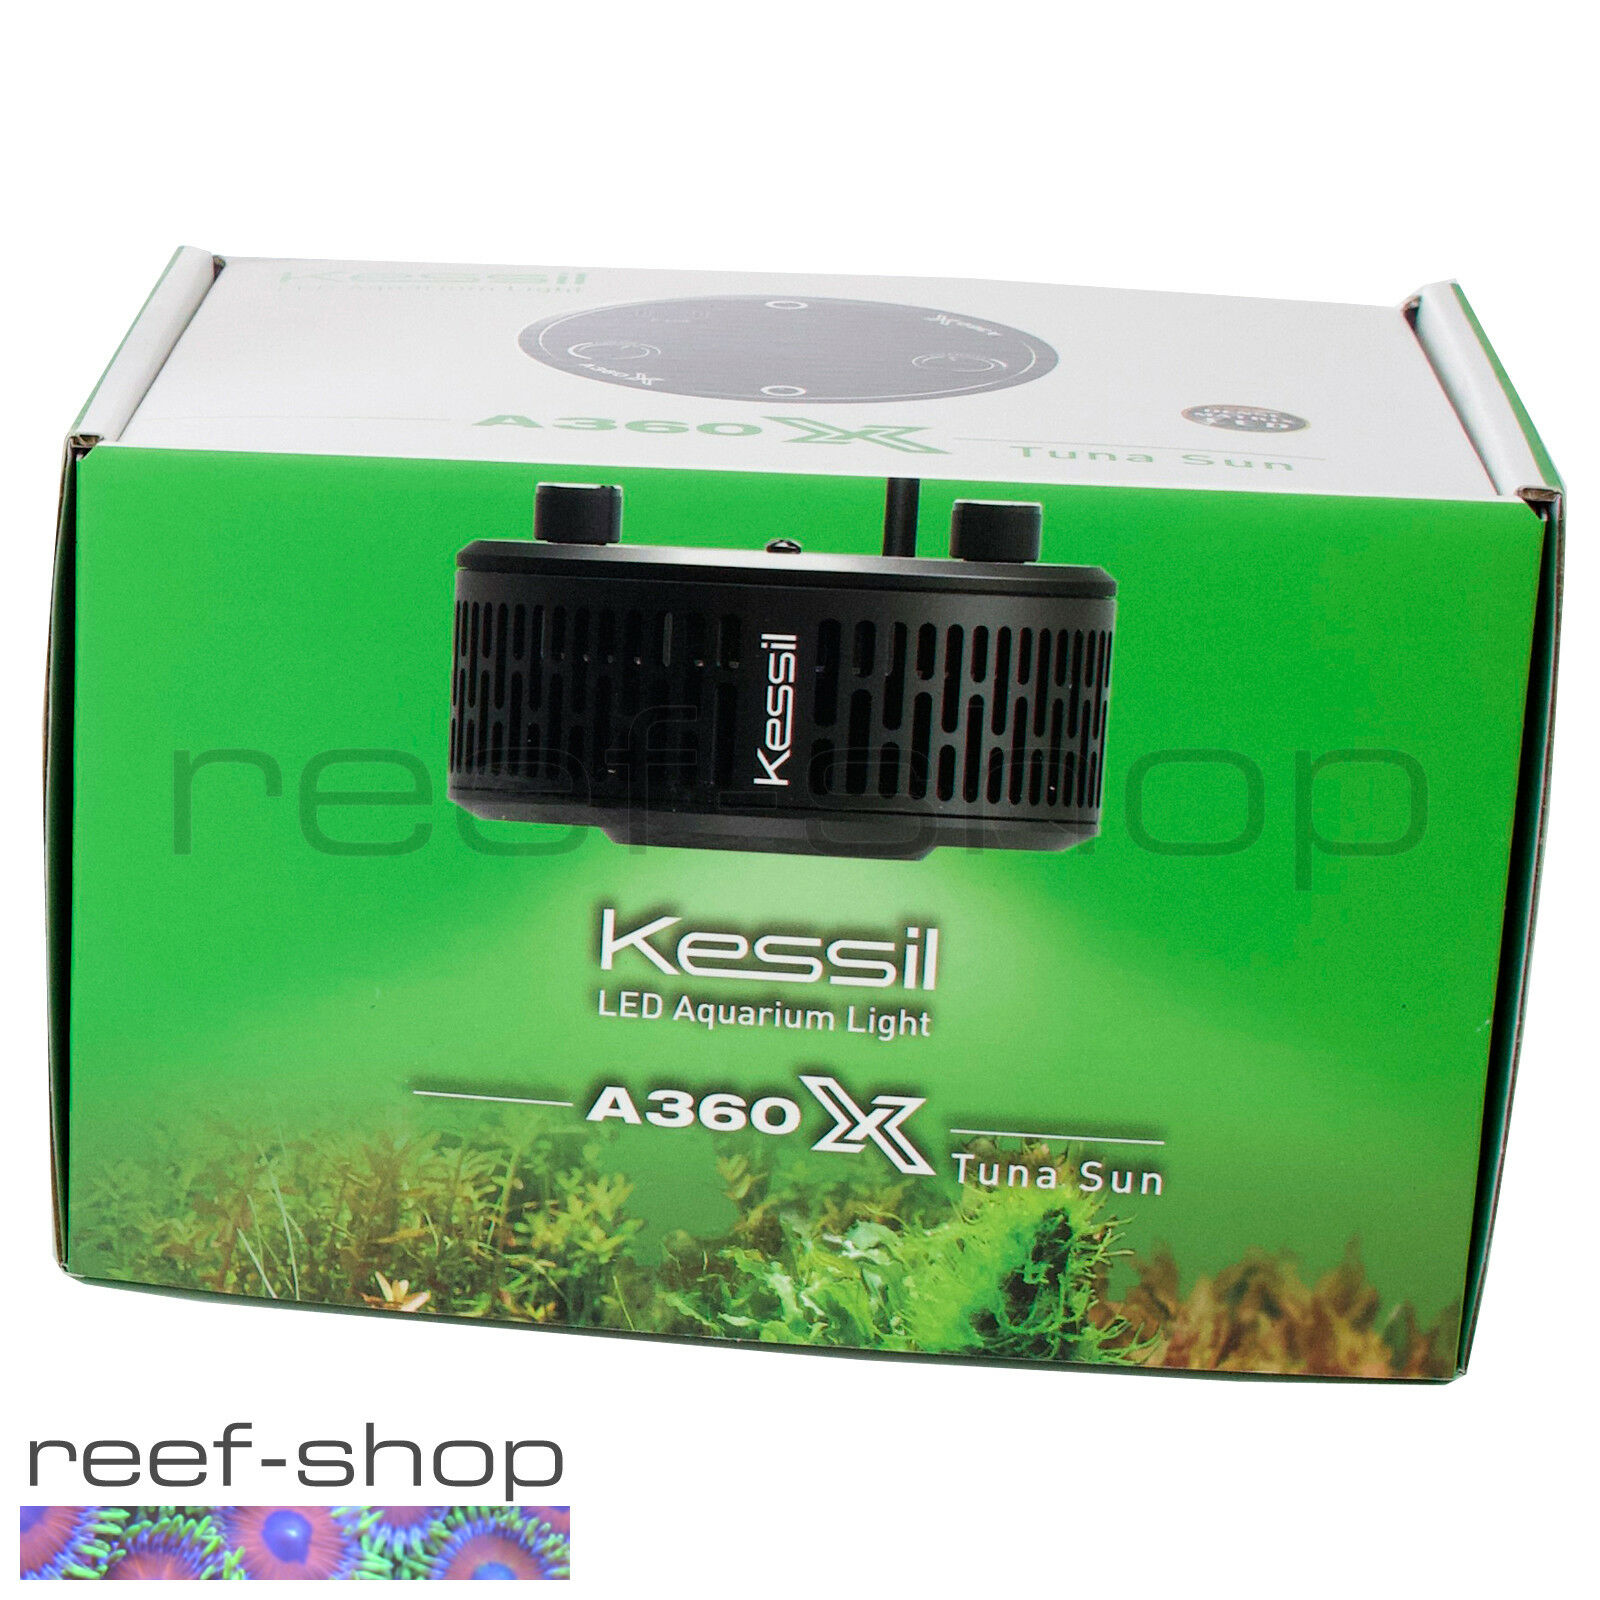 NEW Kessil A360X Tuna Sun LED Light Freshwater Aquarium Fast Free USA Shipping